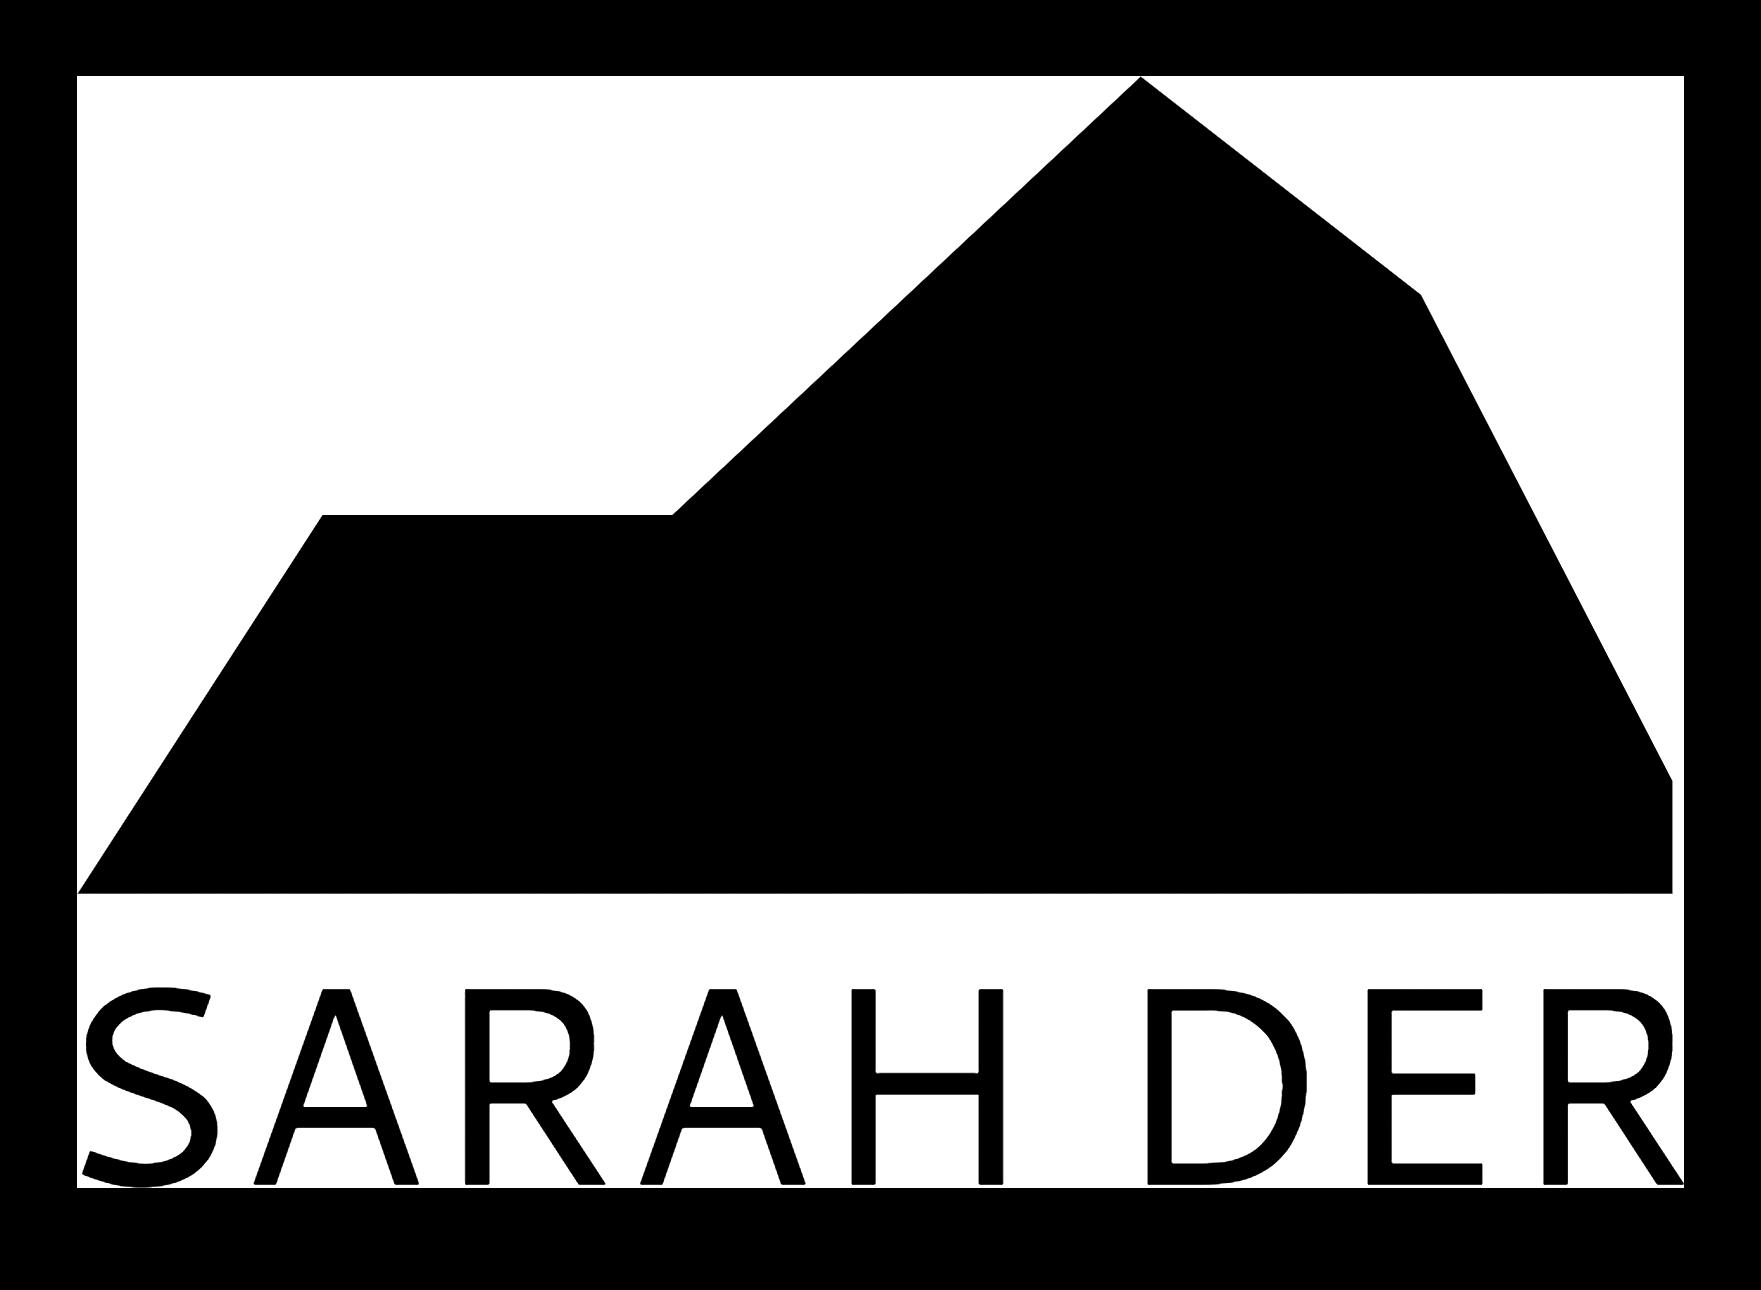 SARAH-DER-logo.png